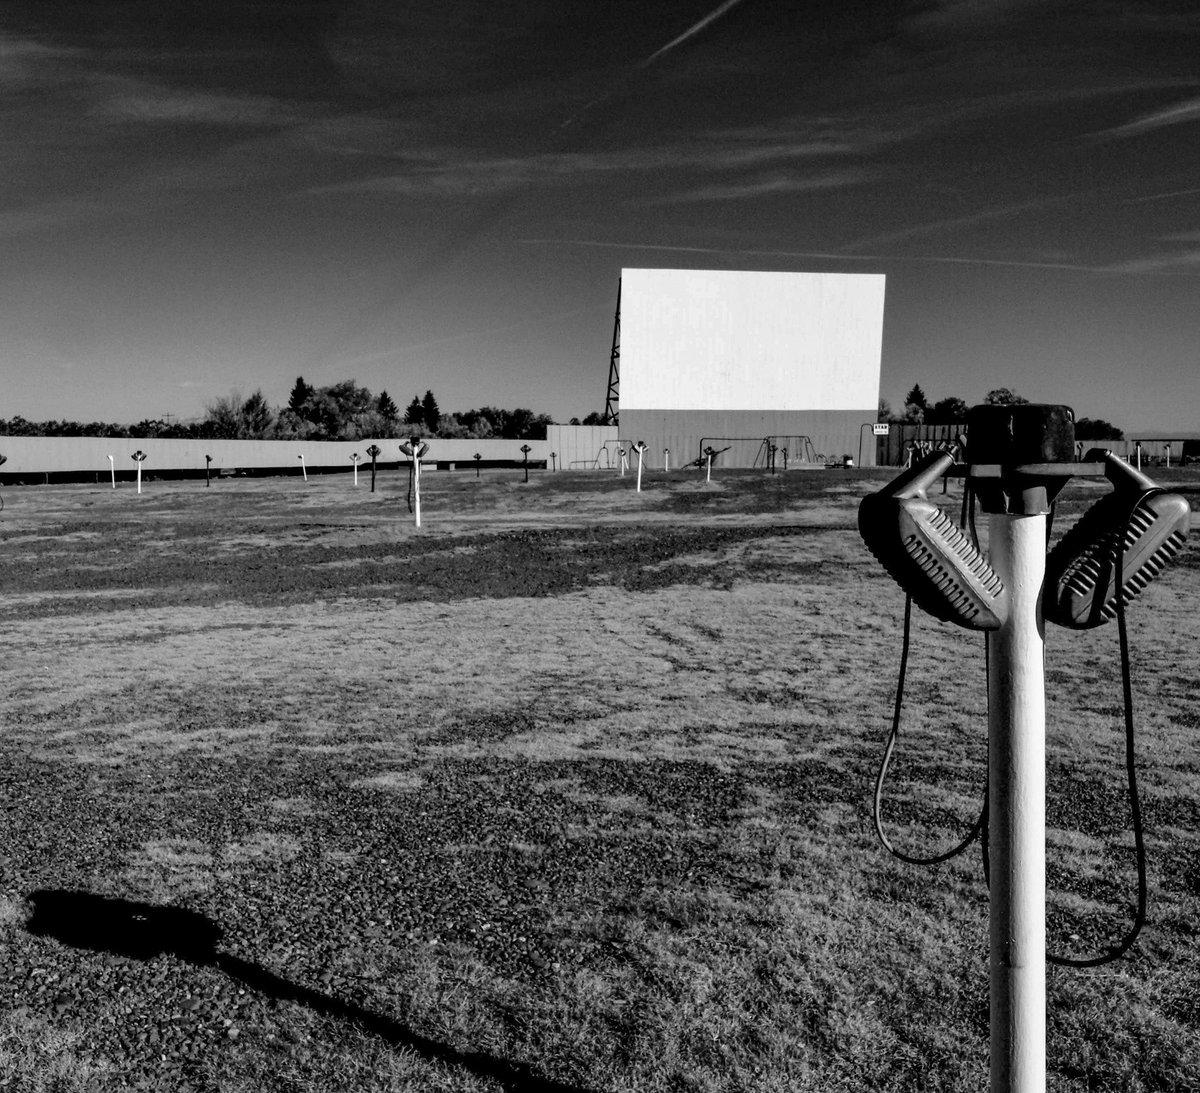 Drive-in theater, Monte Vista, Colorado, October 2008. https://t.co/oKDHtQEtdx